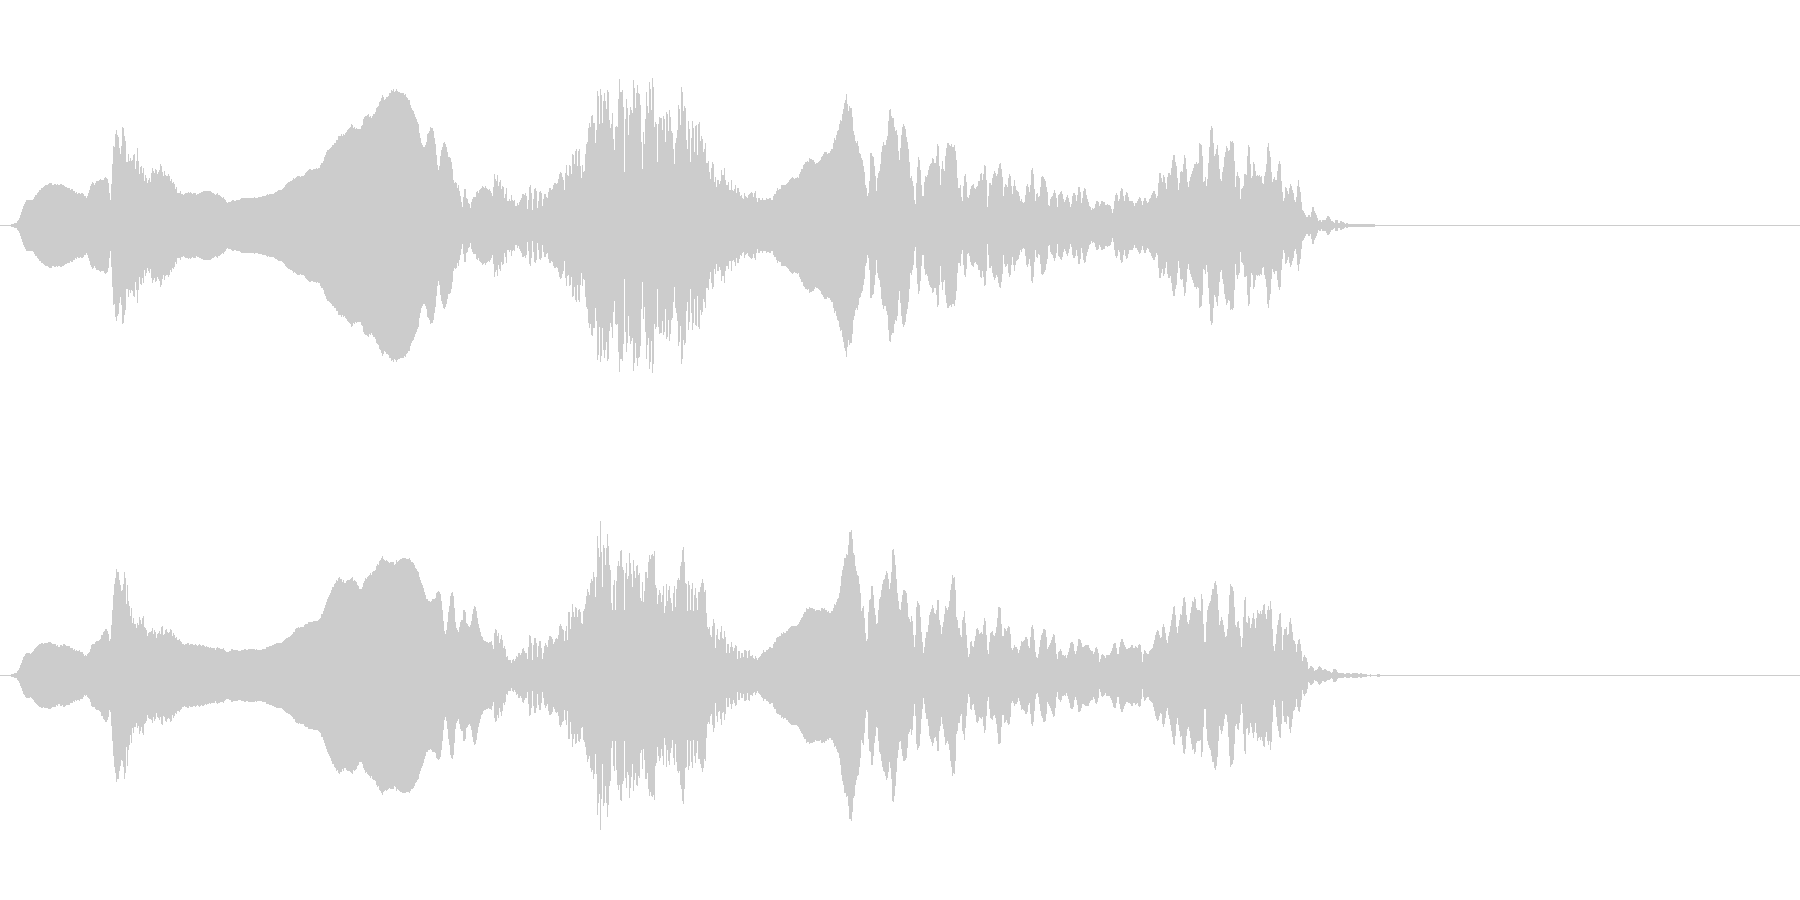 尺八 生演奏 古典風#3の未再生の波形